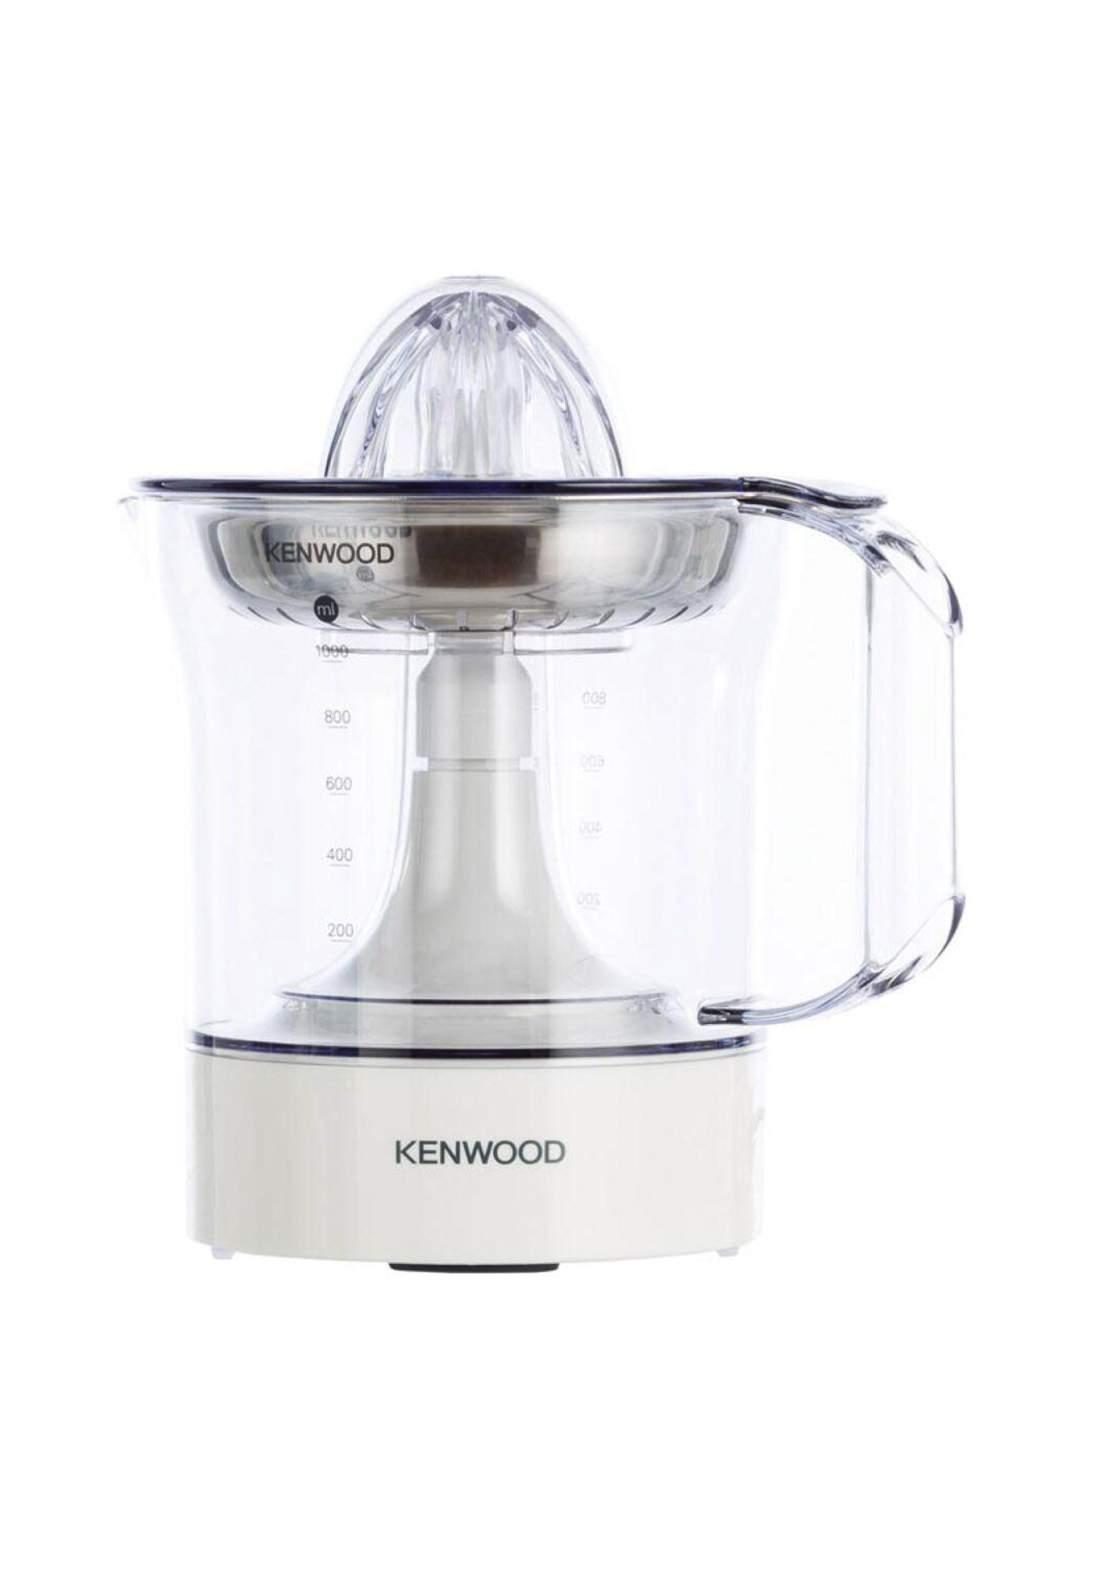 Kenwood JE290A True Citrus Press Juicer عصارة حمضيات